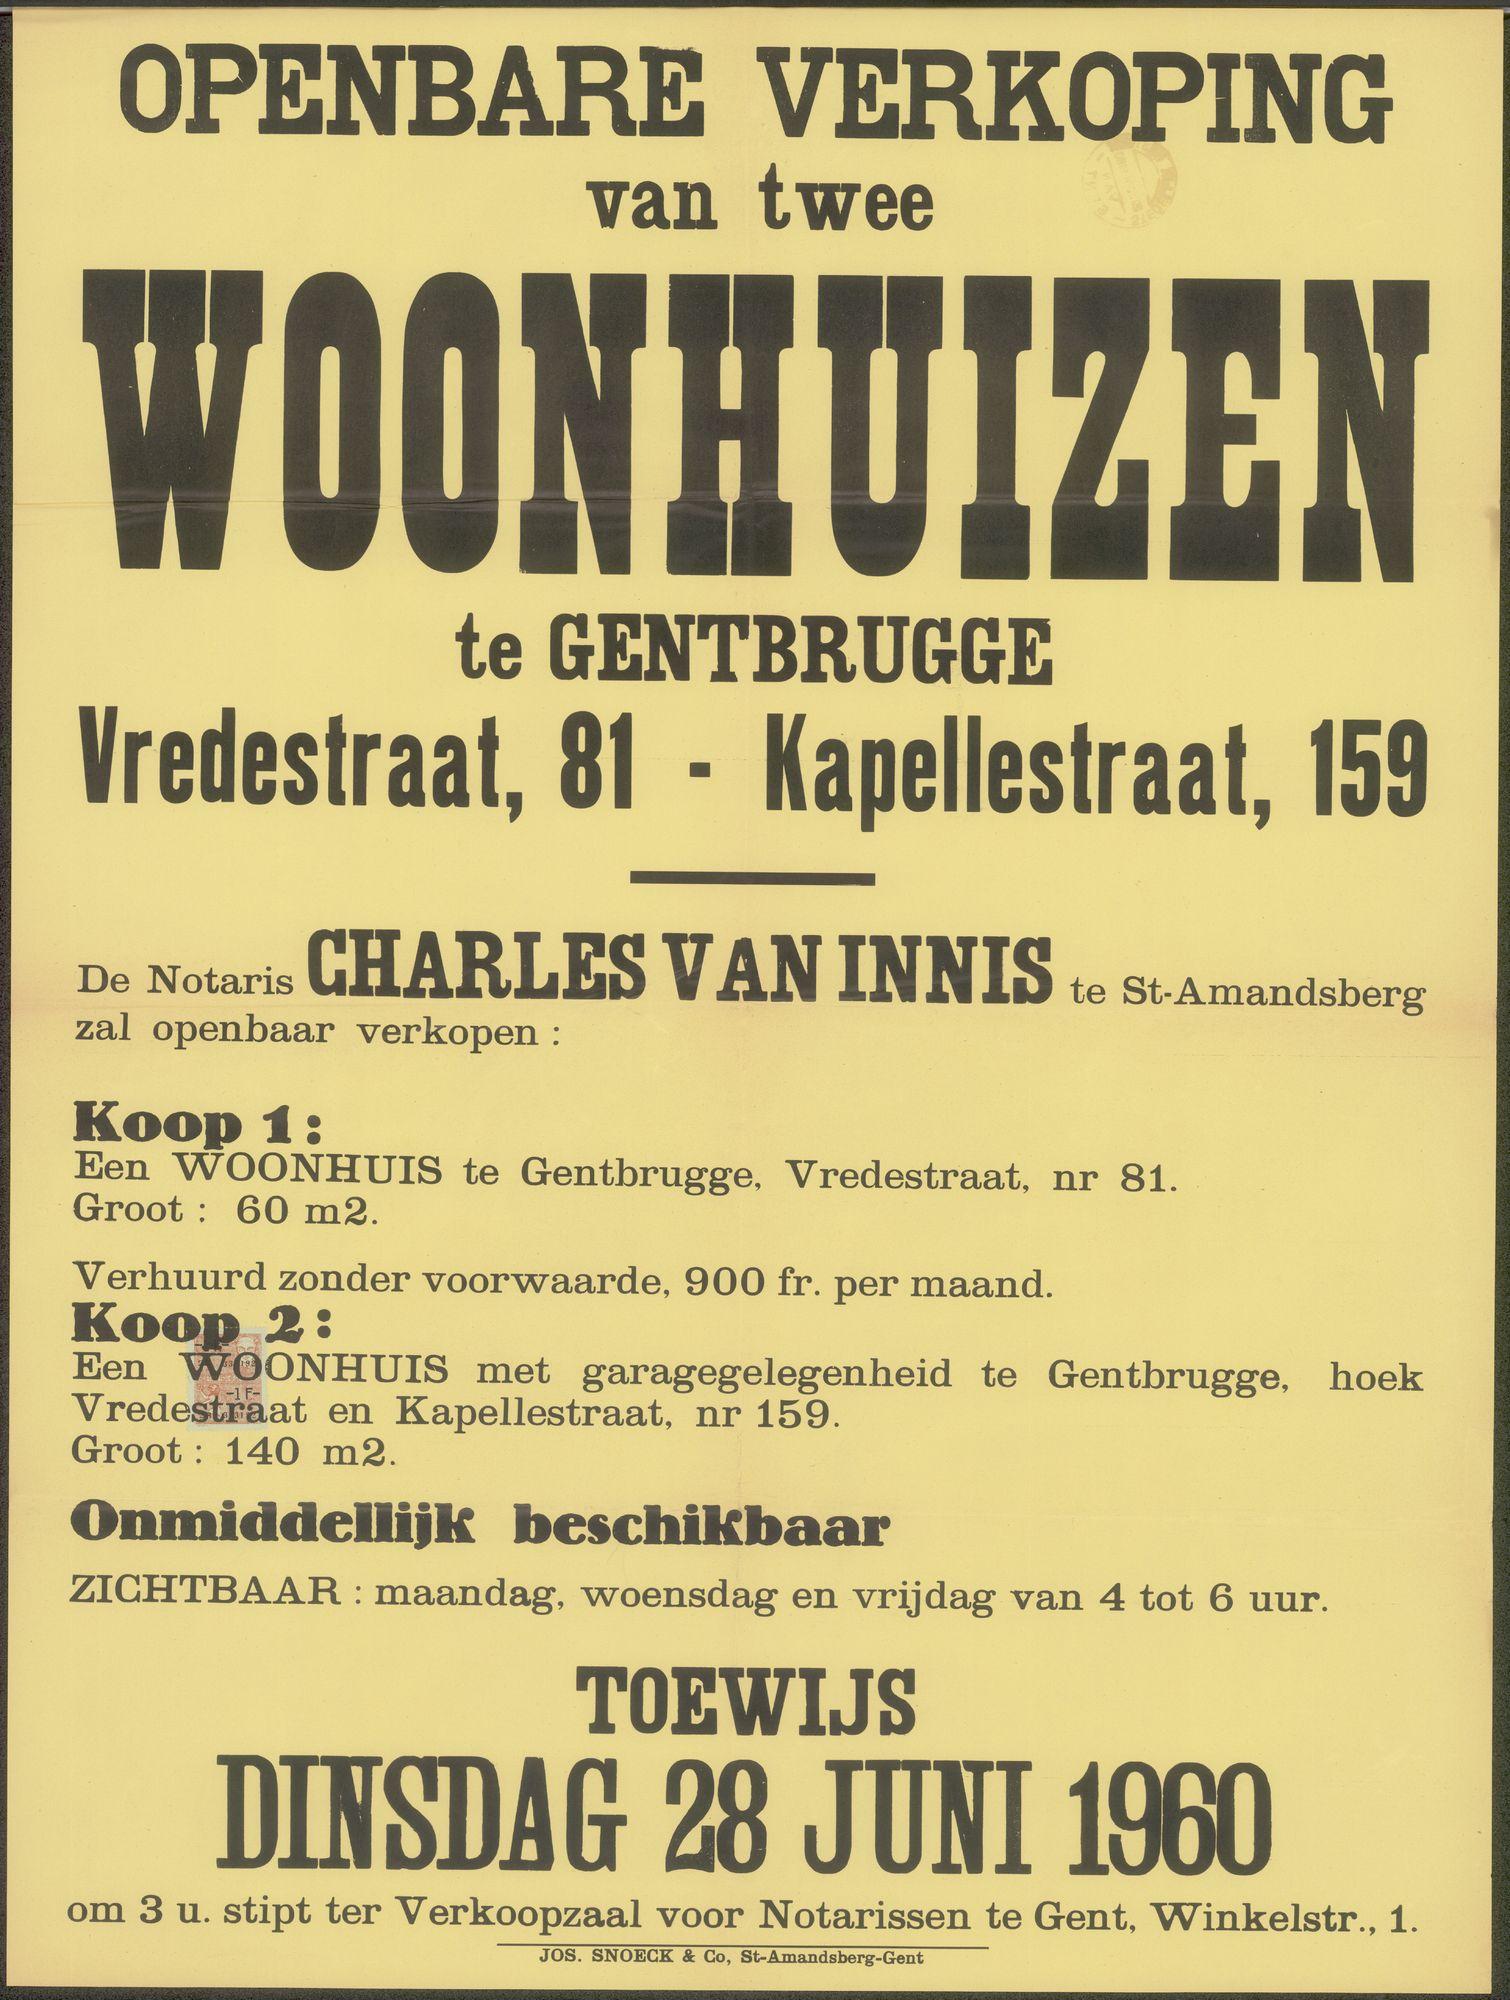 Openbare verkoop van twee woonhuizen te Gentbrugge, Vredestraat, nr. 81 - Kapellestraat, nr.159, Gent, 28 juni 1960